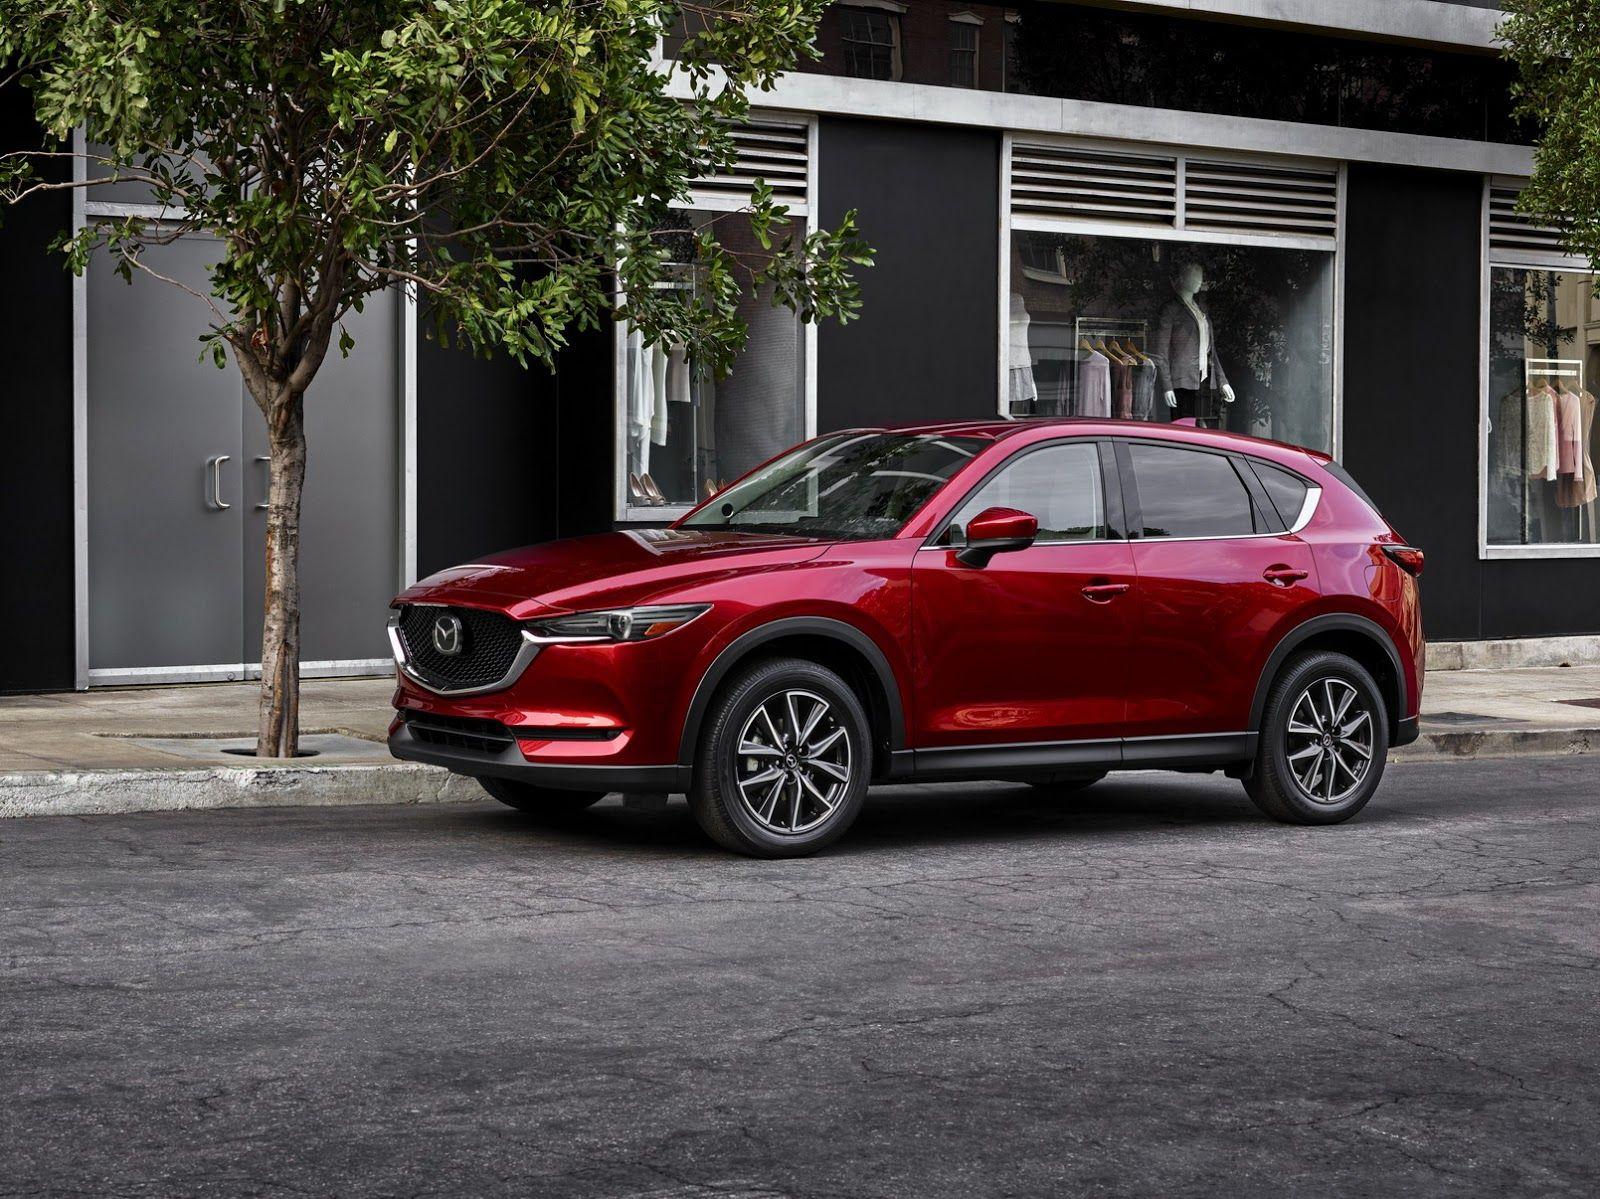 Mazda S All New 2017 Cx 5 Gets Overhauled Design And New Tech Carscoops Mazda Cx5 Mazda Dream Cars